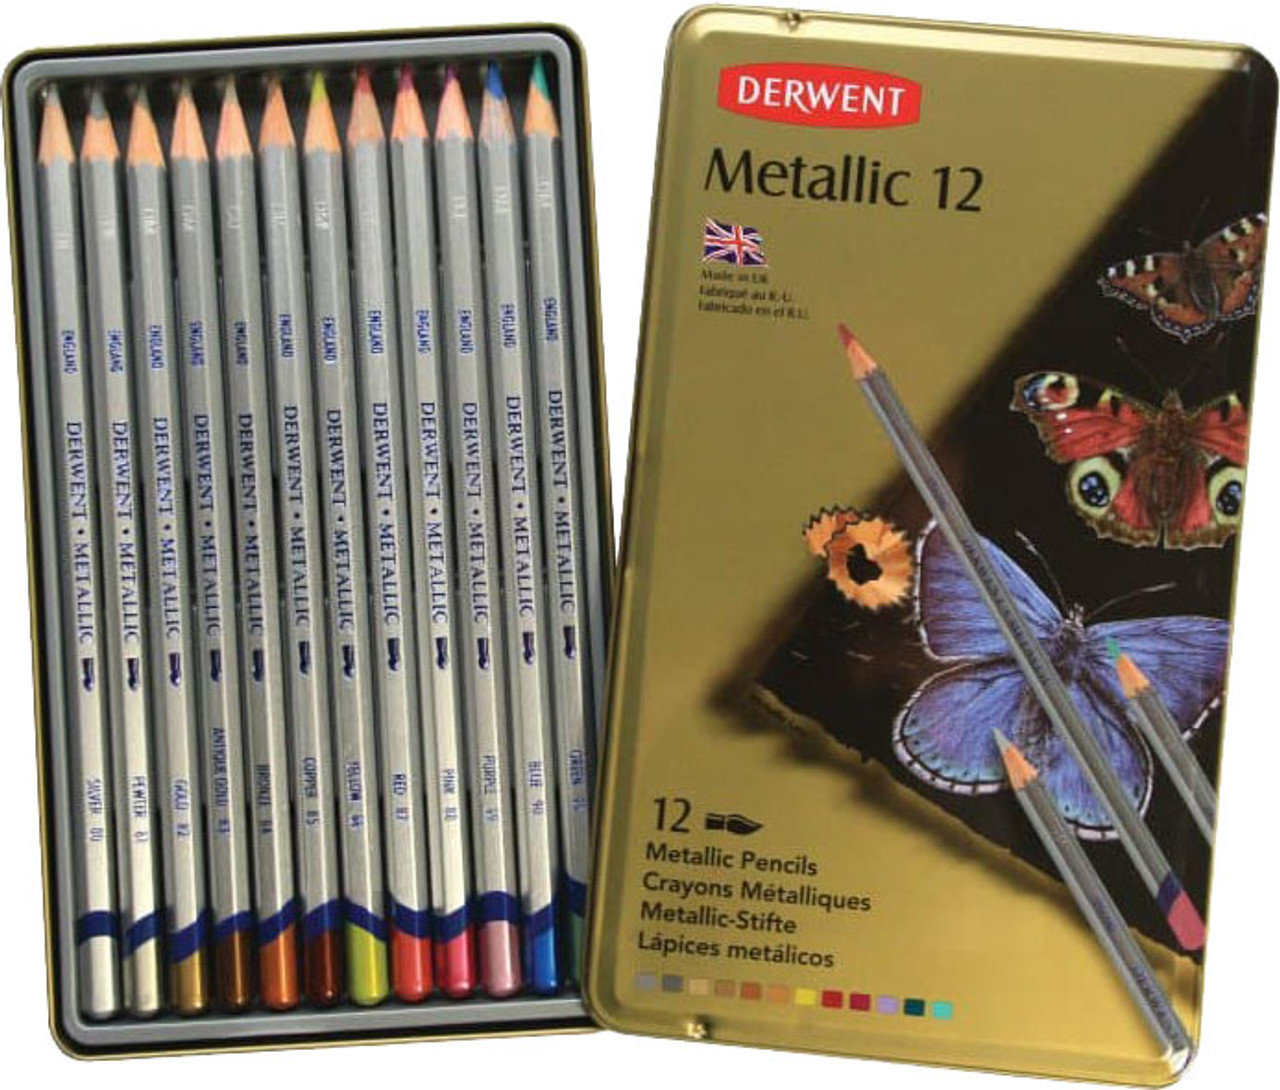 Derwent Metallic Pencil 12pc Tin Set